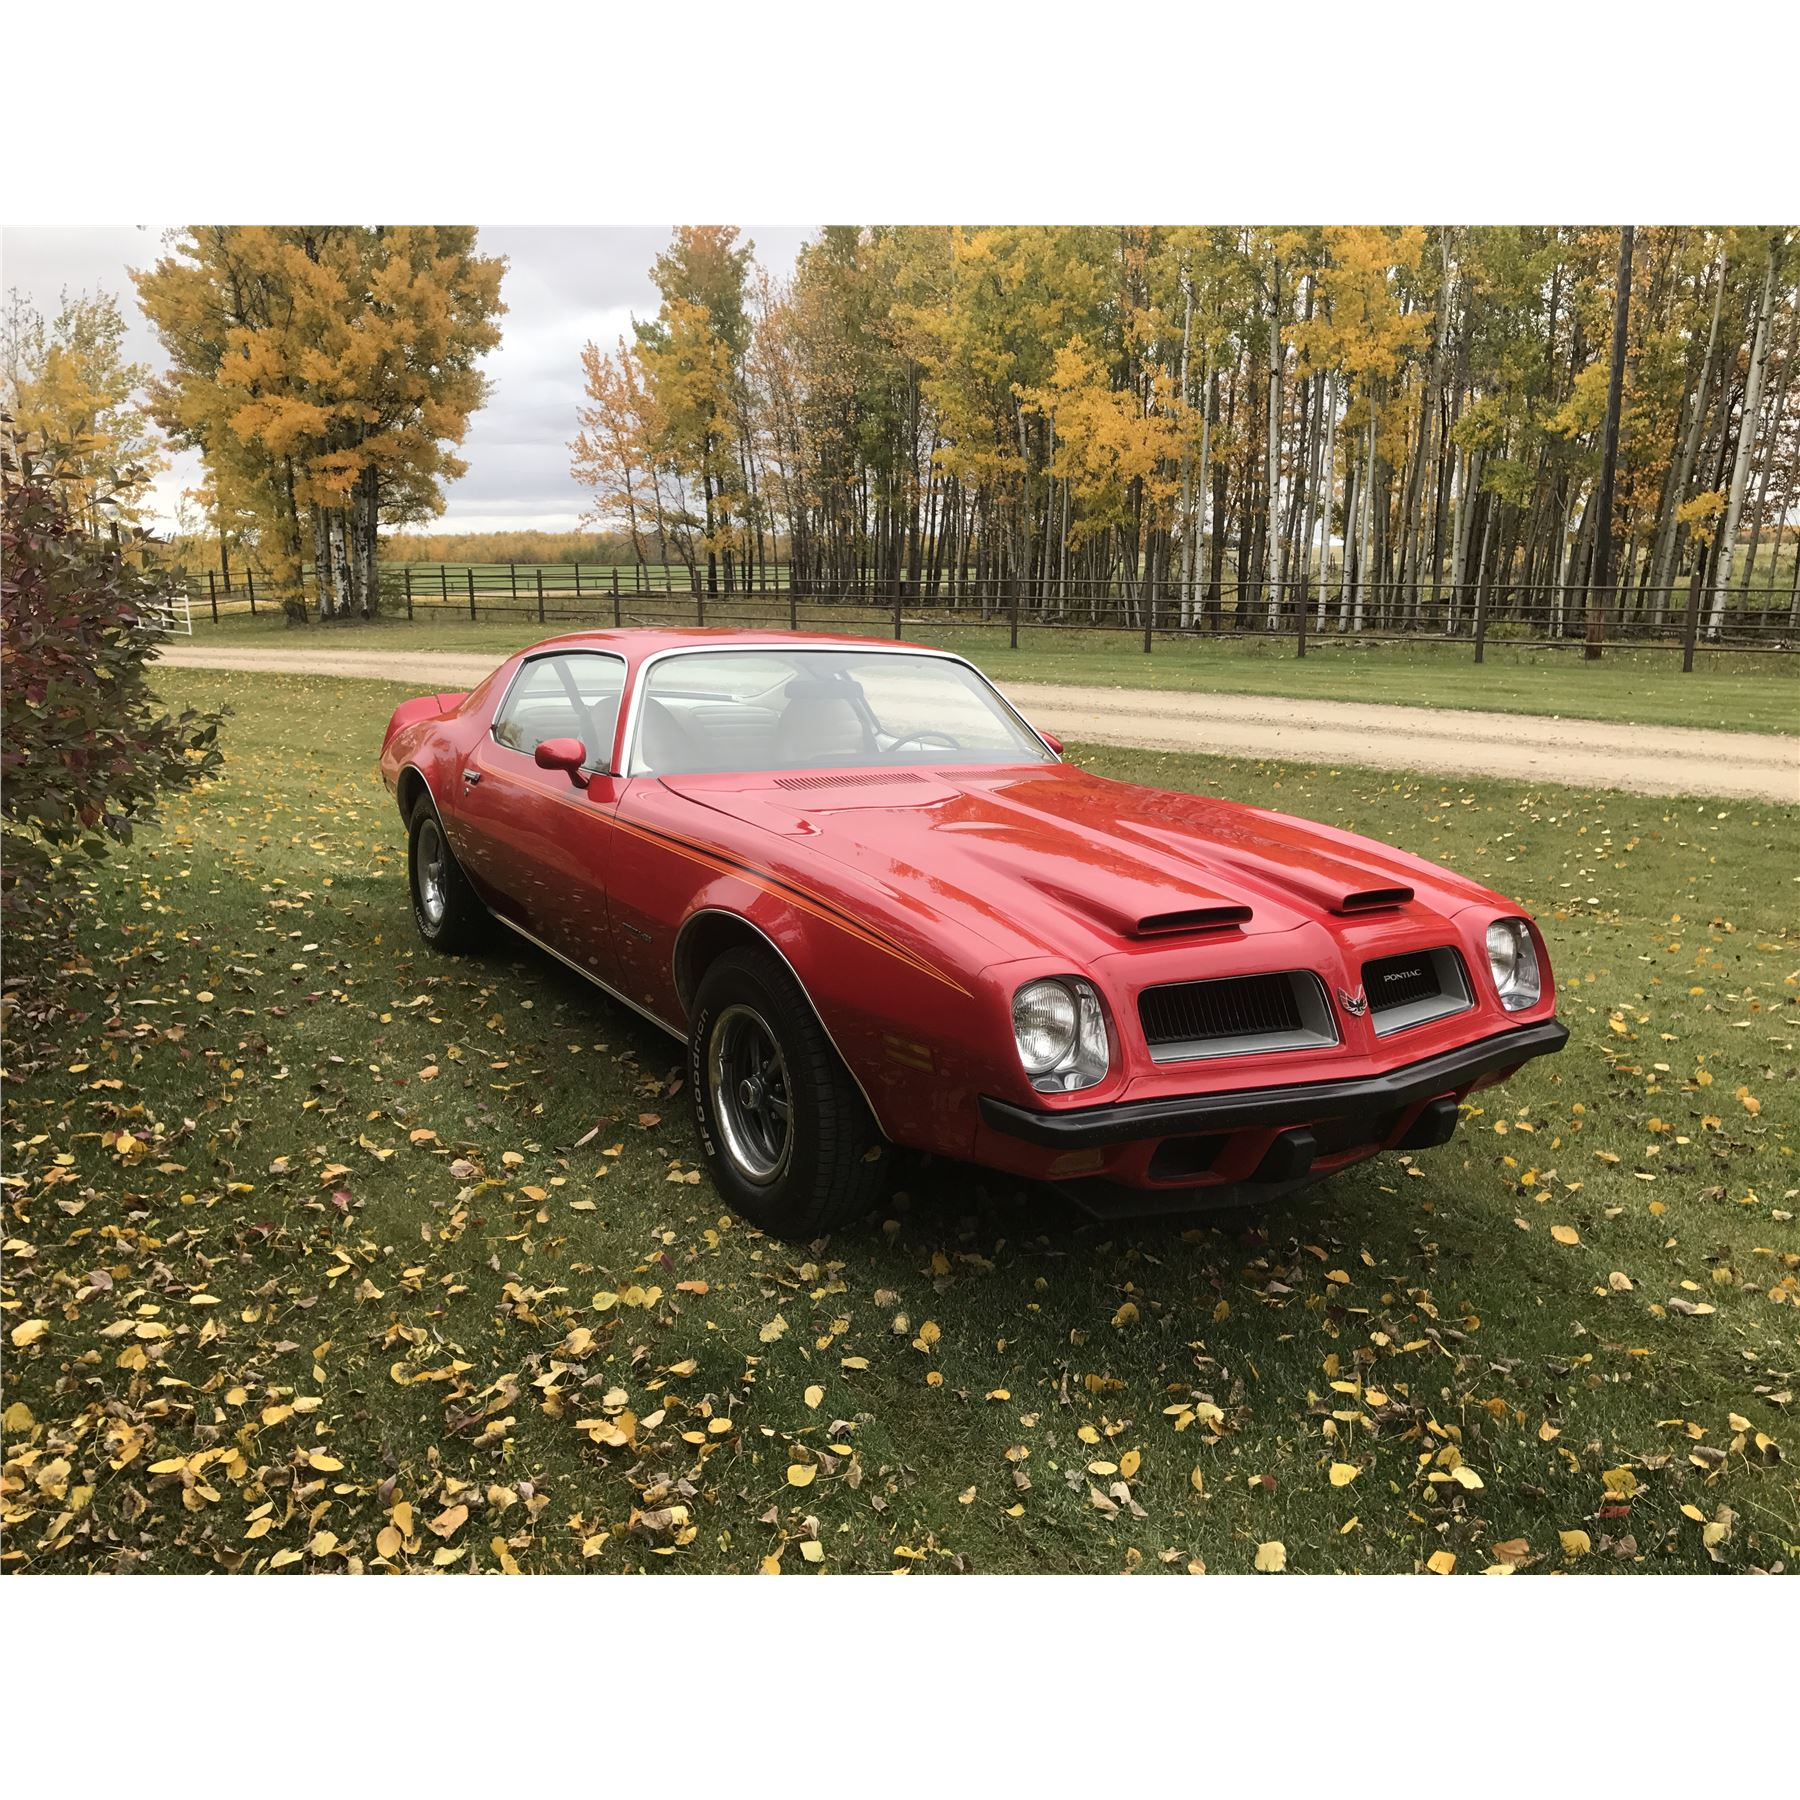 1974 PONTIAC FIREBIRD FORMULA 455 1 OF 160 RAM AIR BIG BLOCKS